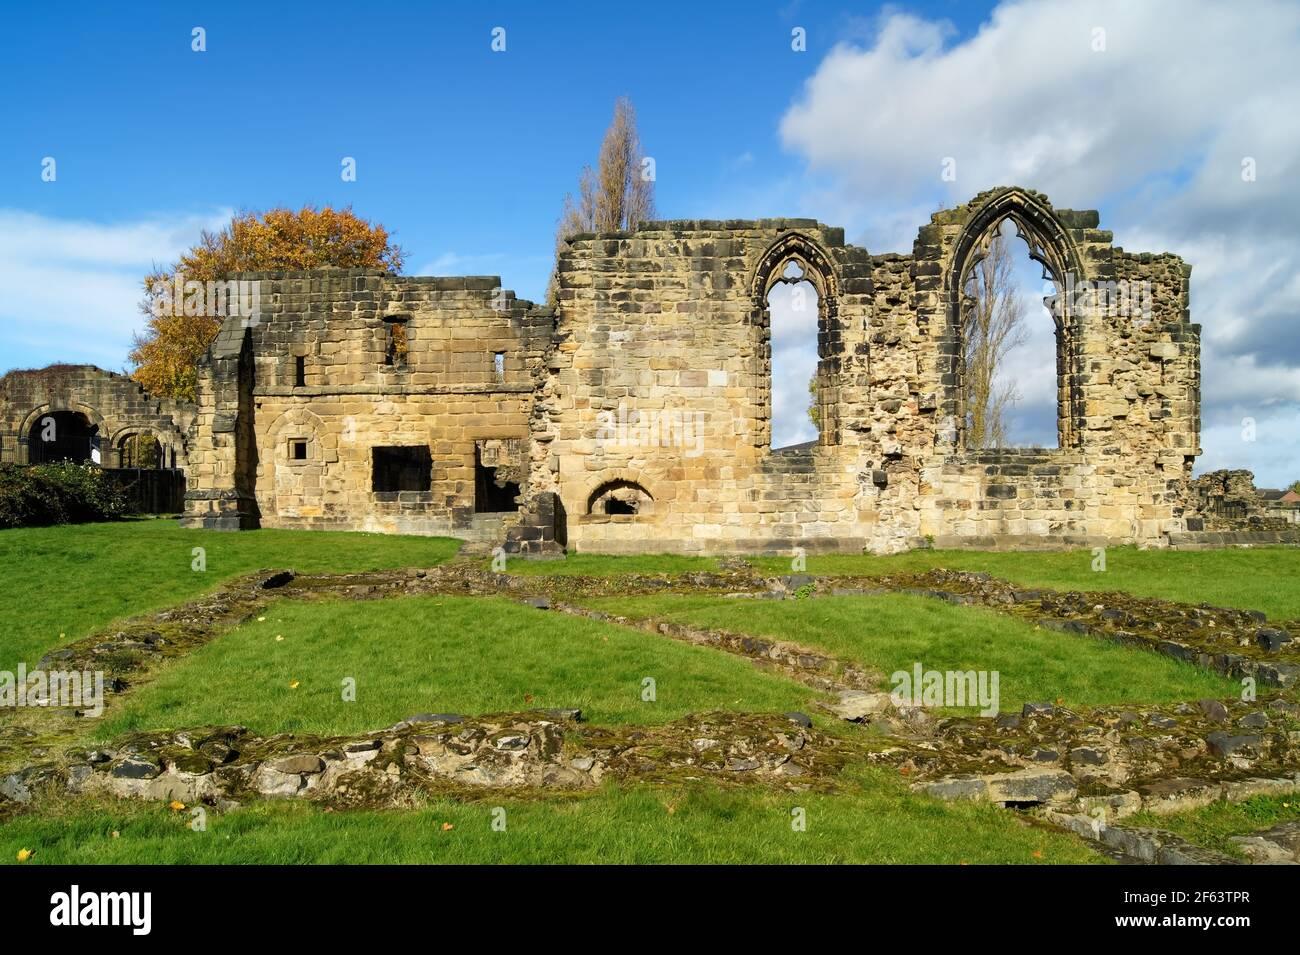 Royaume-Uni, Yorkshire du Sud, Barnsley, Monk Bretton Priory Banque D'Images